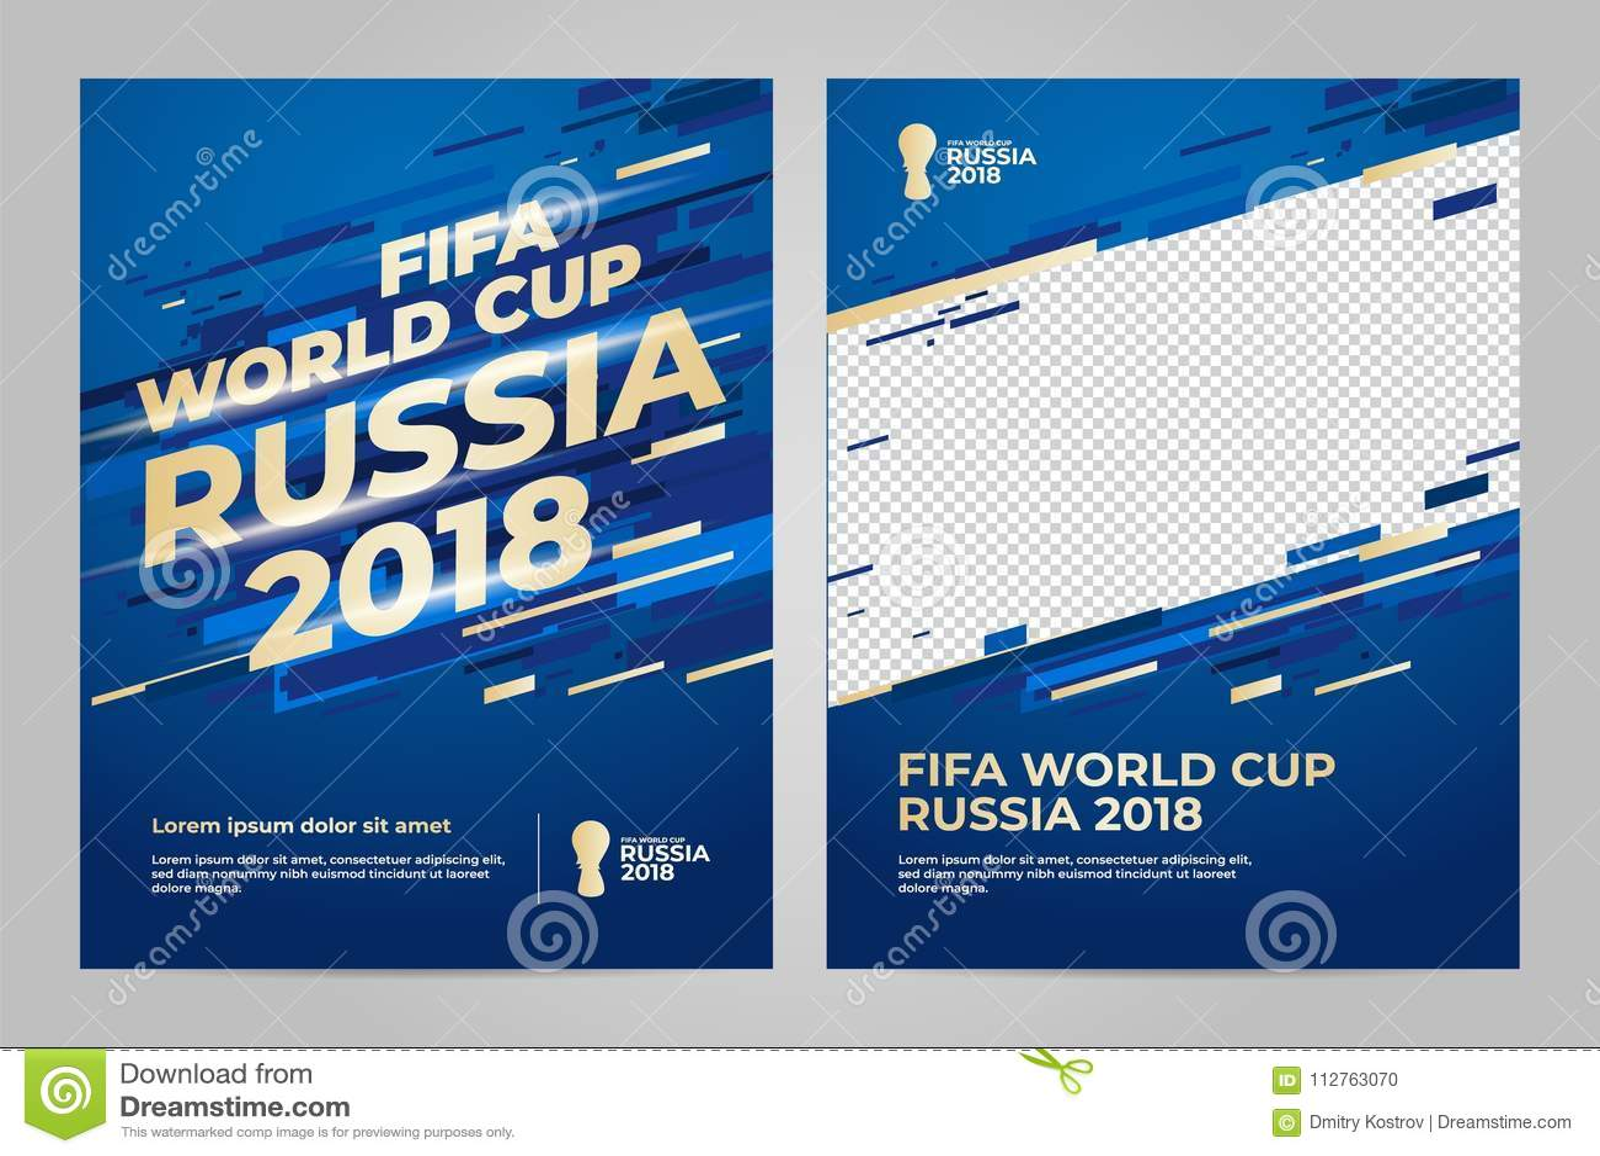 La Russia 2018 tazze mascherina